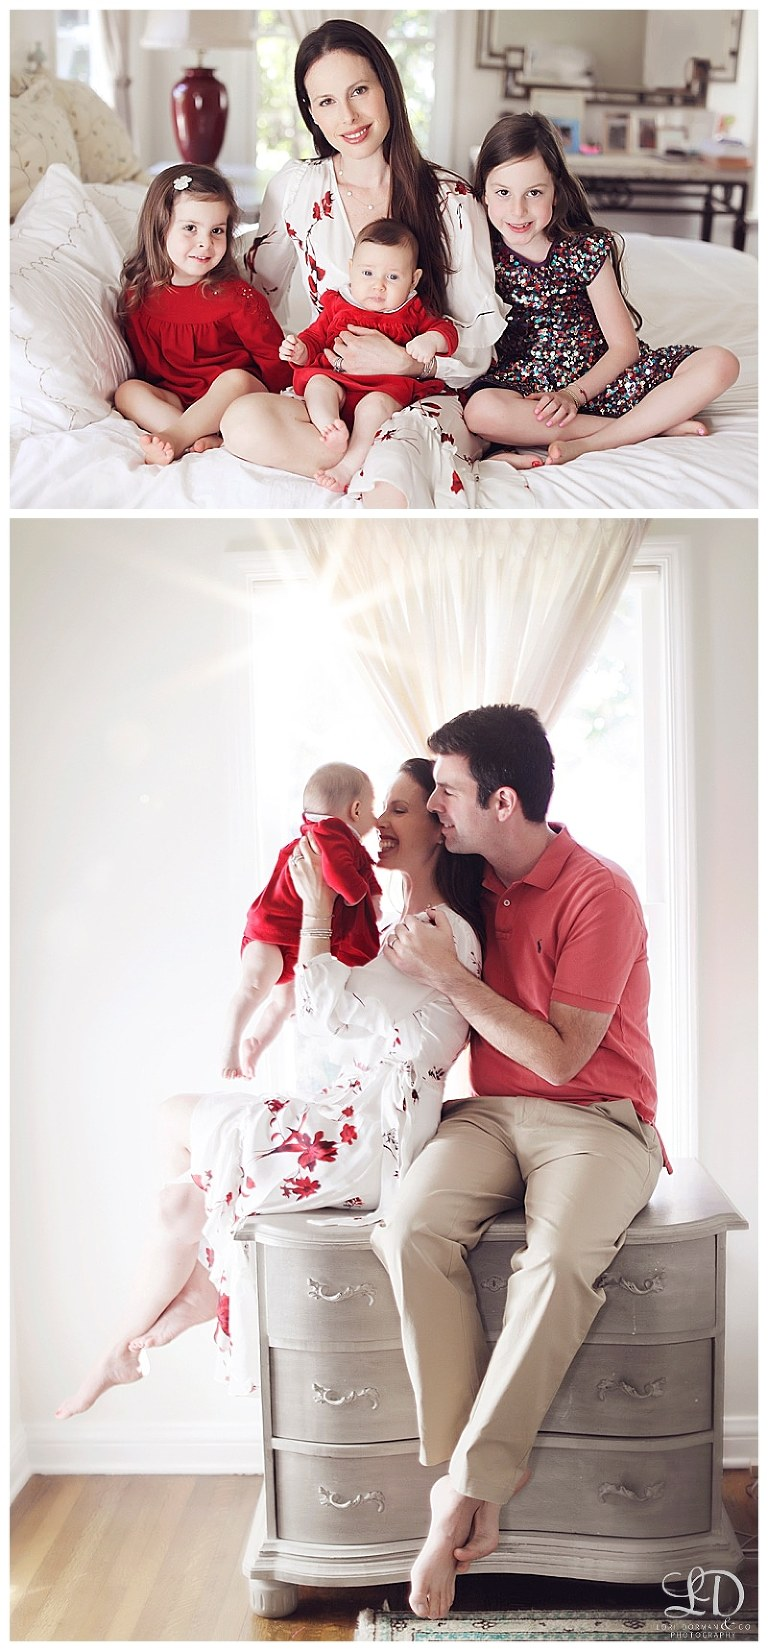 sweet maternity photoshoot-lori dorman photography-maternity boudoir-professional photographer_4946.jpg